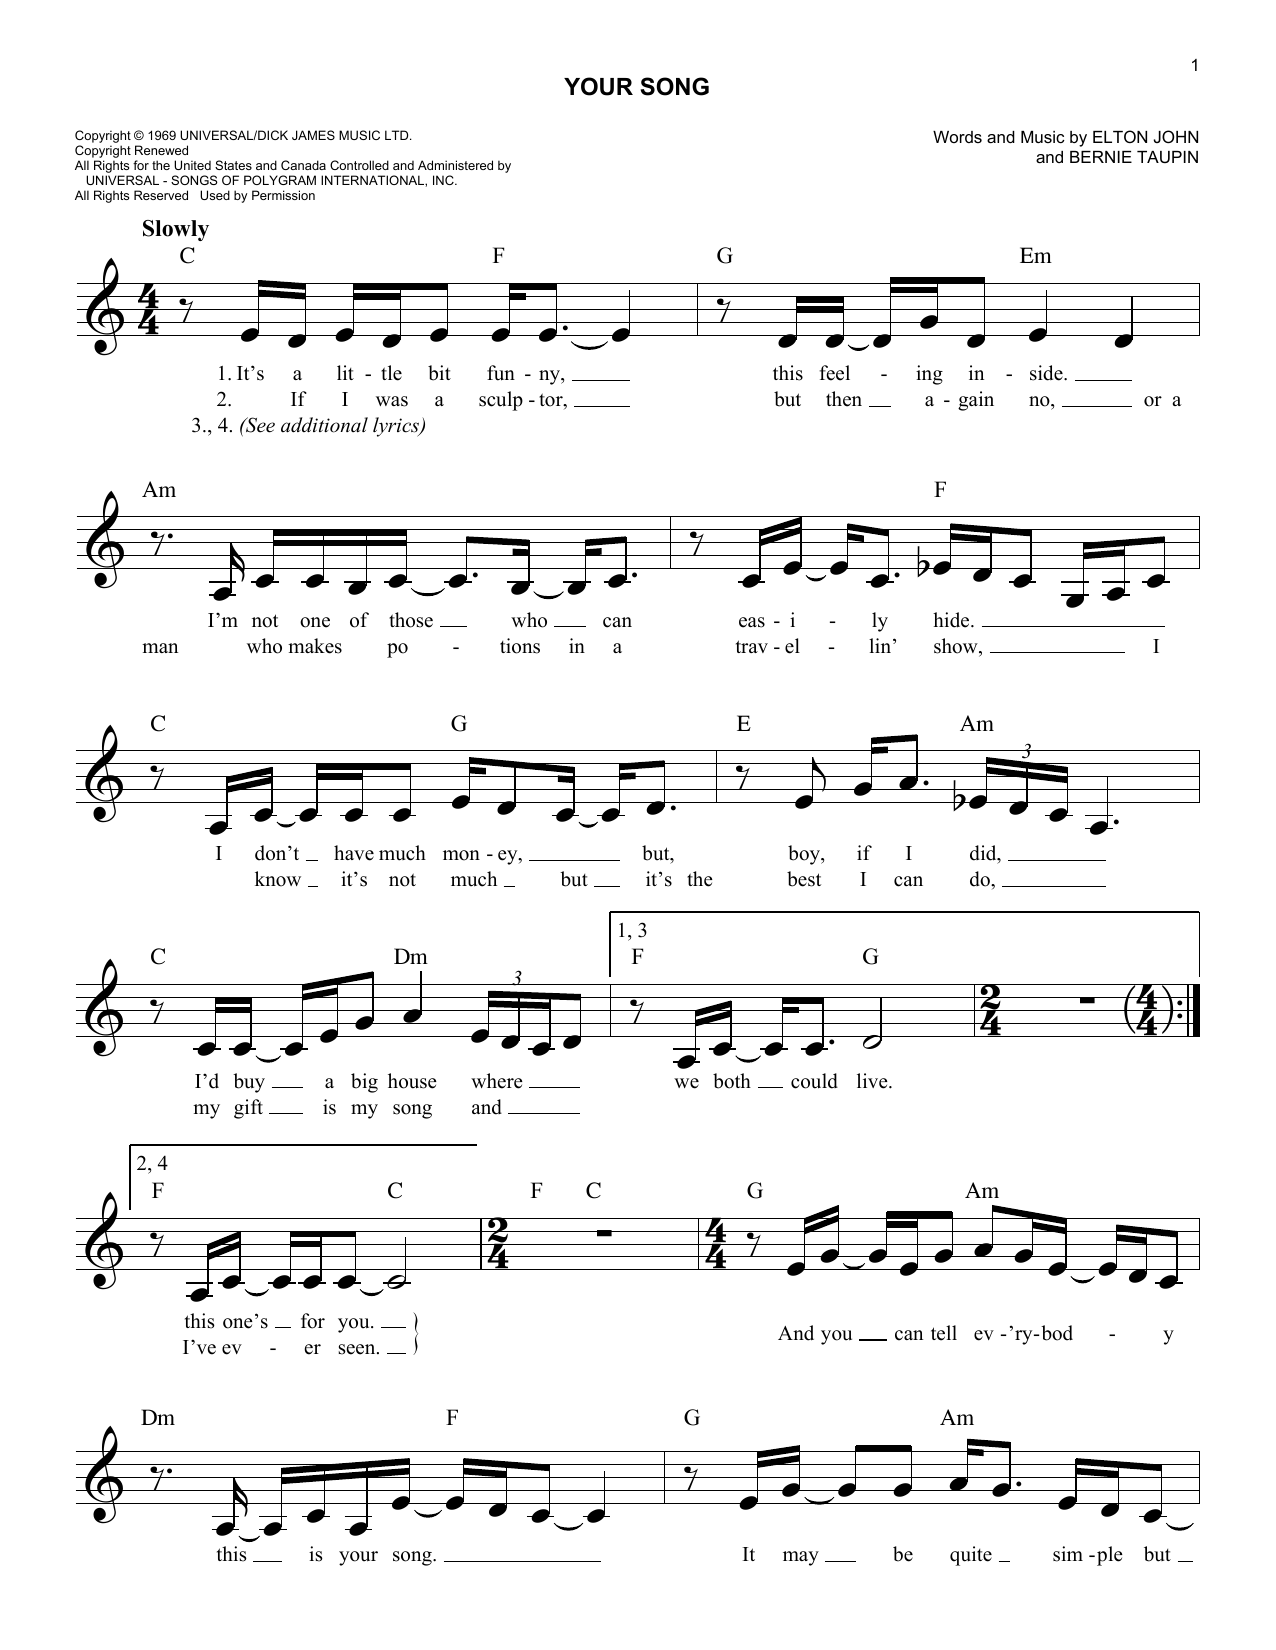 Sheet Music Digital Files To Print Licensed Bernie Taupin Digital